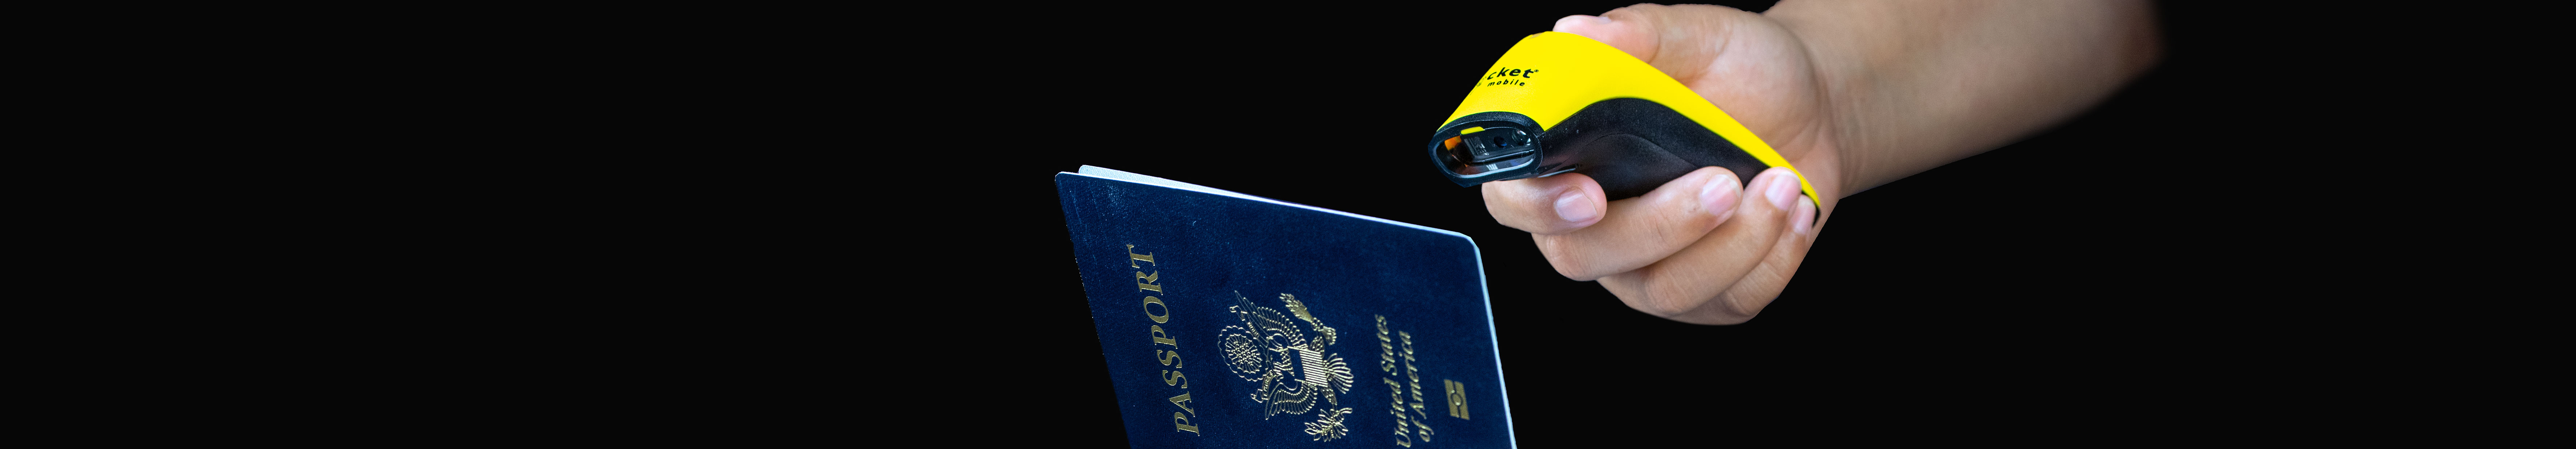 s760-scanning-passport-3440px